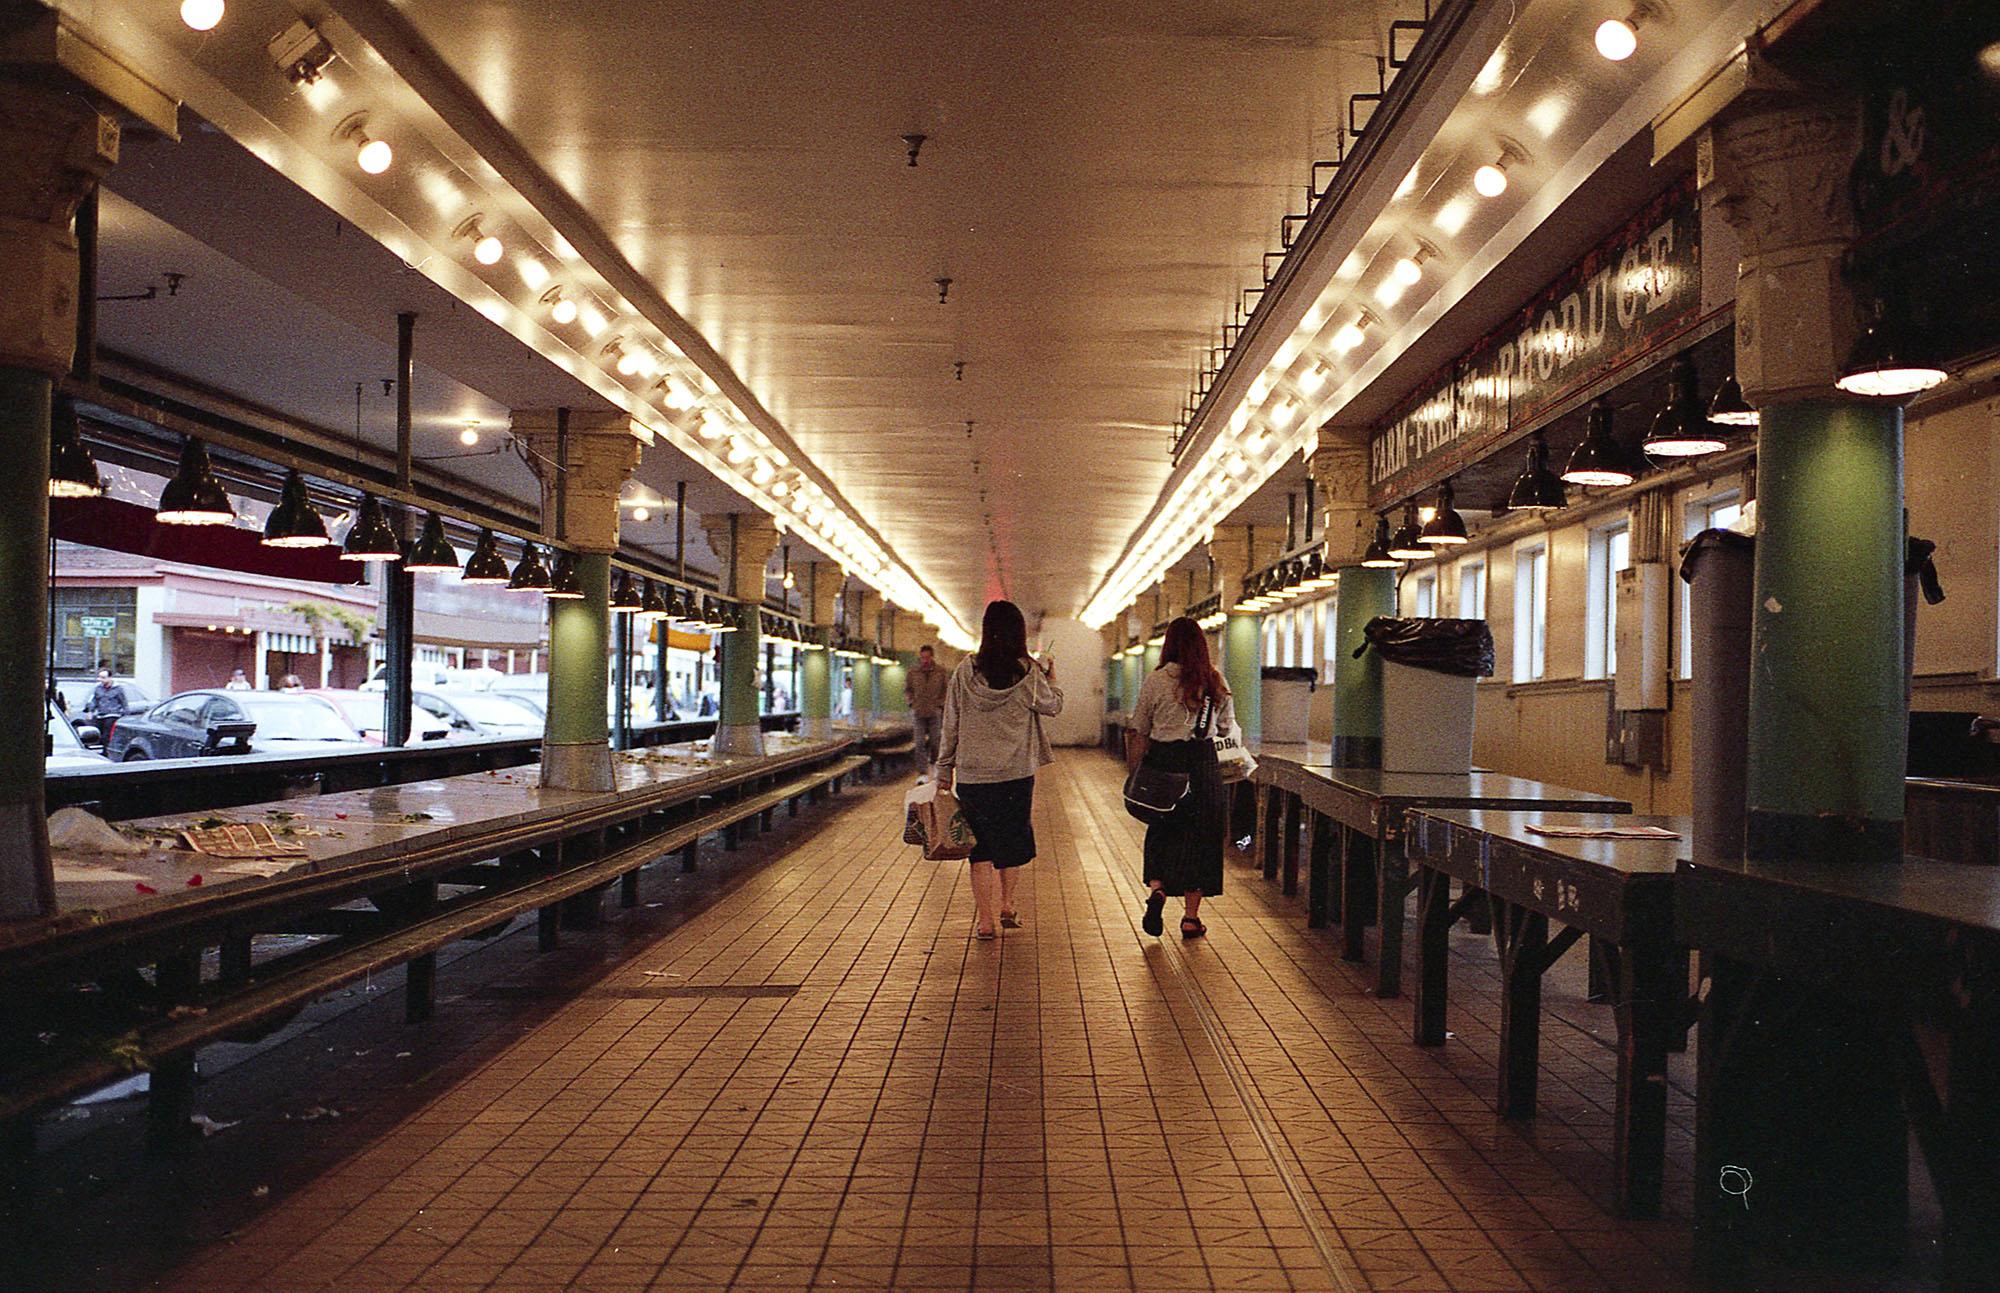 12FujiColor200 (LeicaM6)010.jpg